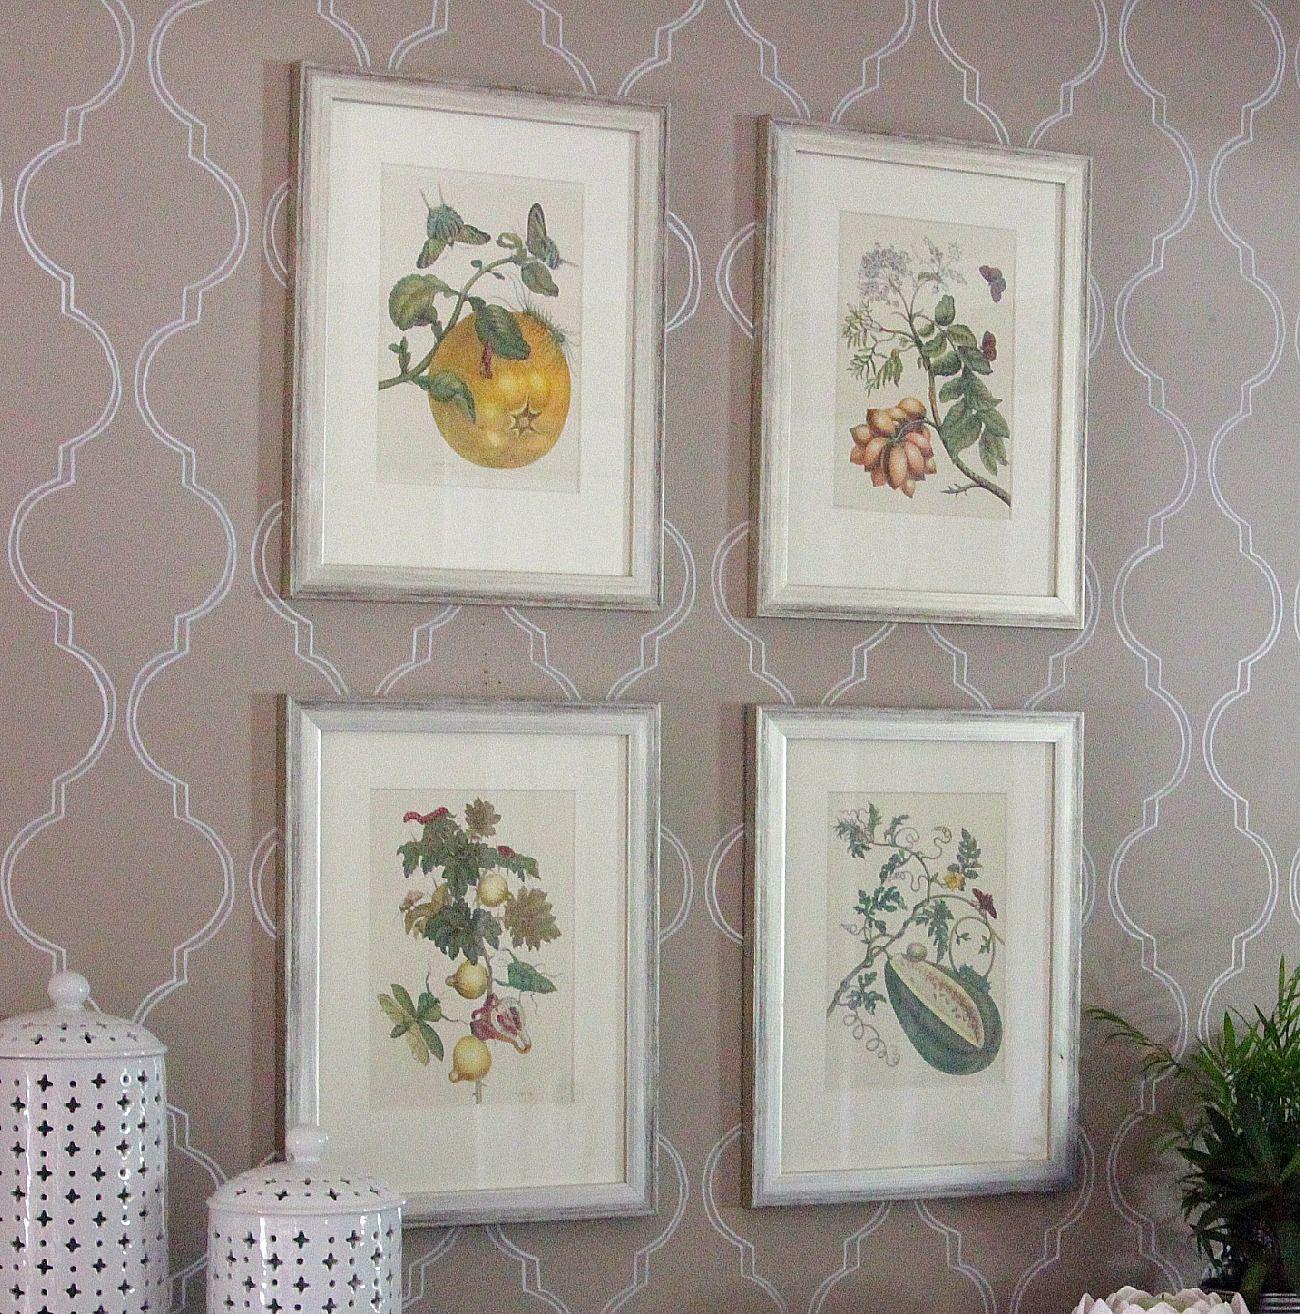 The Lovely Cupboard: Three DIY Art Ideas  Using @Kristin Croissant's lovely calender